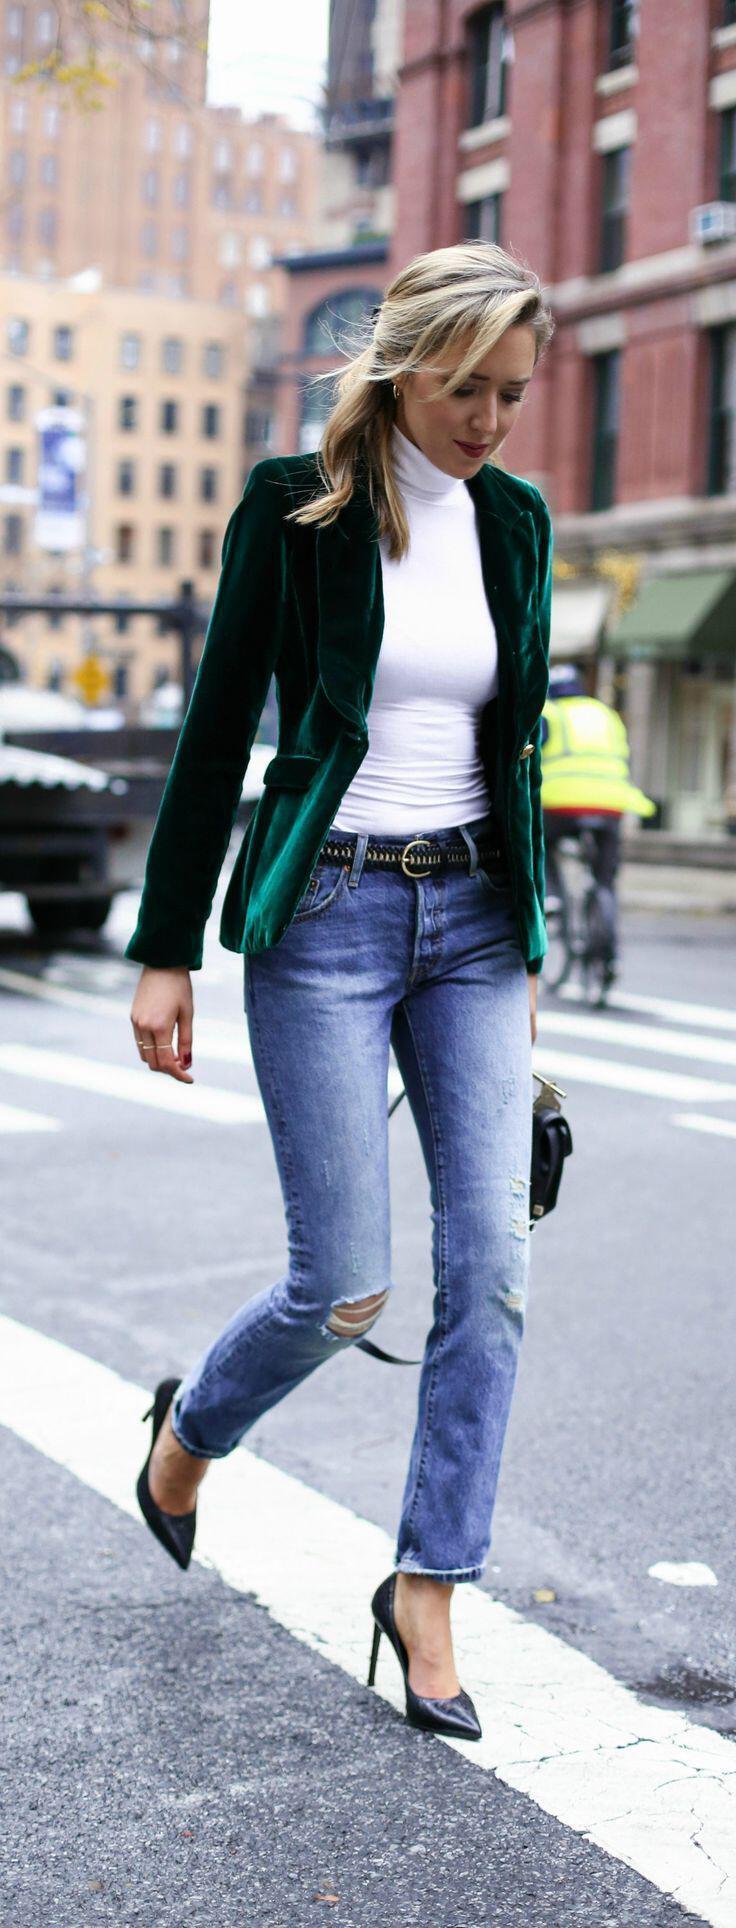 how to wear velvet outfits this fall 8 - Πως να φορέσεις βελούδο το χειμώνα